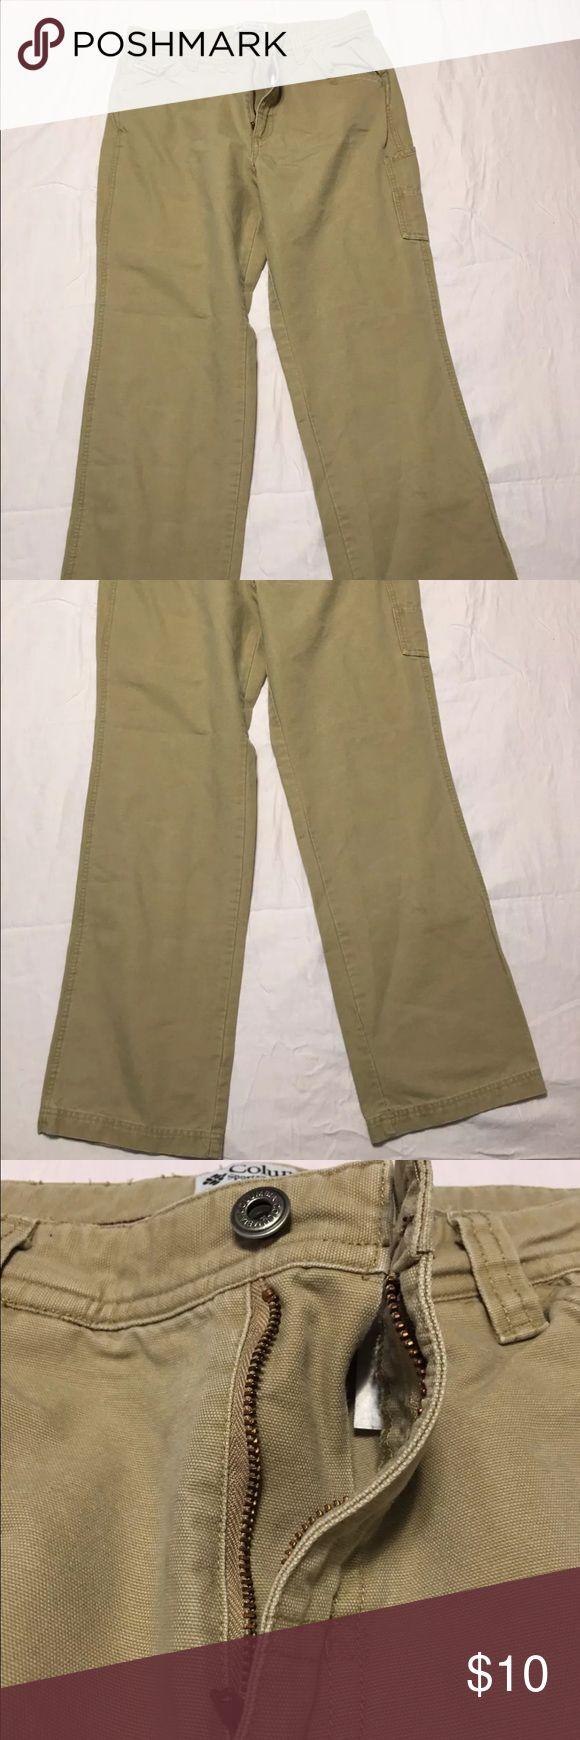 Women's Columbia Sportswear Khaki Pants Sz 10 Size 10 Regular. In great condition! Worn only a few times Columbia Pants Straight Leg